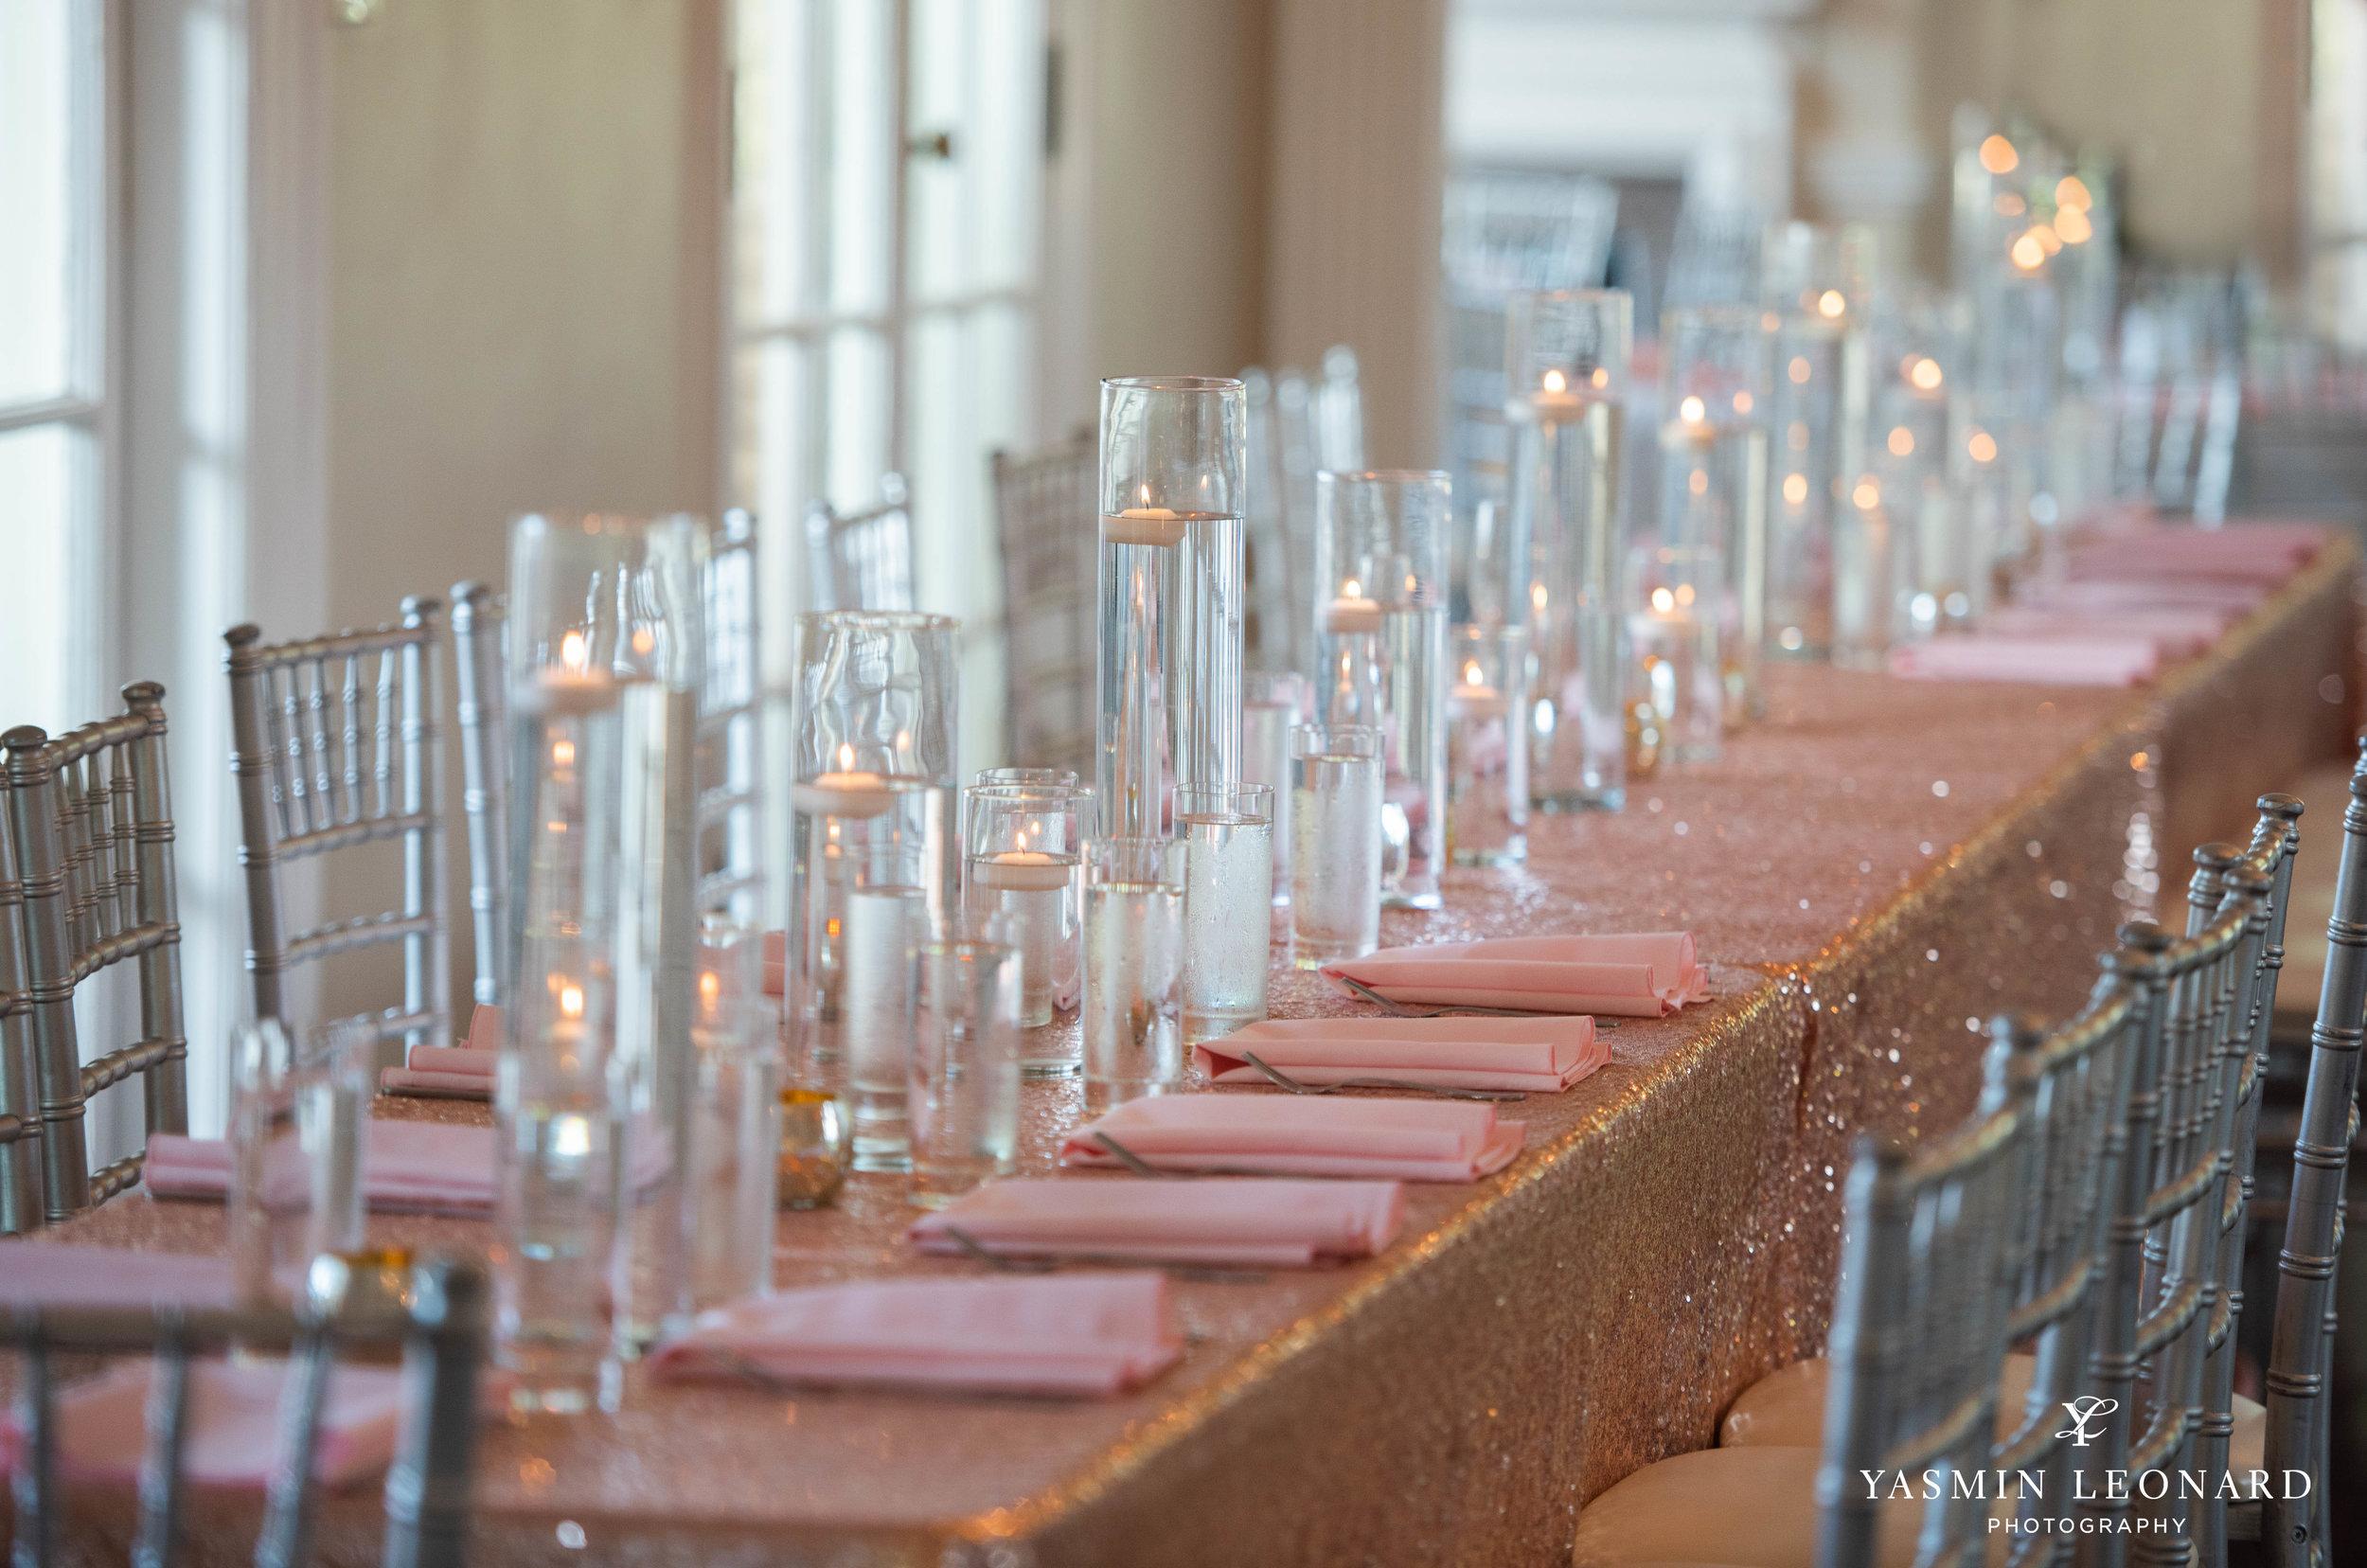 Separk Mansion - NC Weddings - Gastonia Wedding - NC Wedding Venues - Pink and Blue Wedding Ideas - Pink Bridesmaid Dresses - Yasmin Leonard Photography-41.jpg